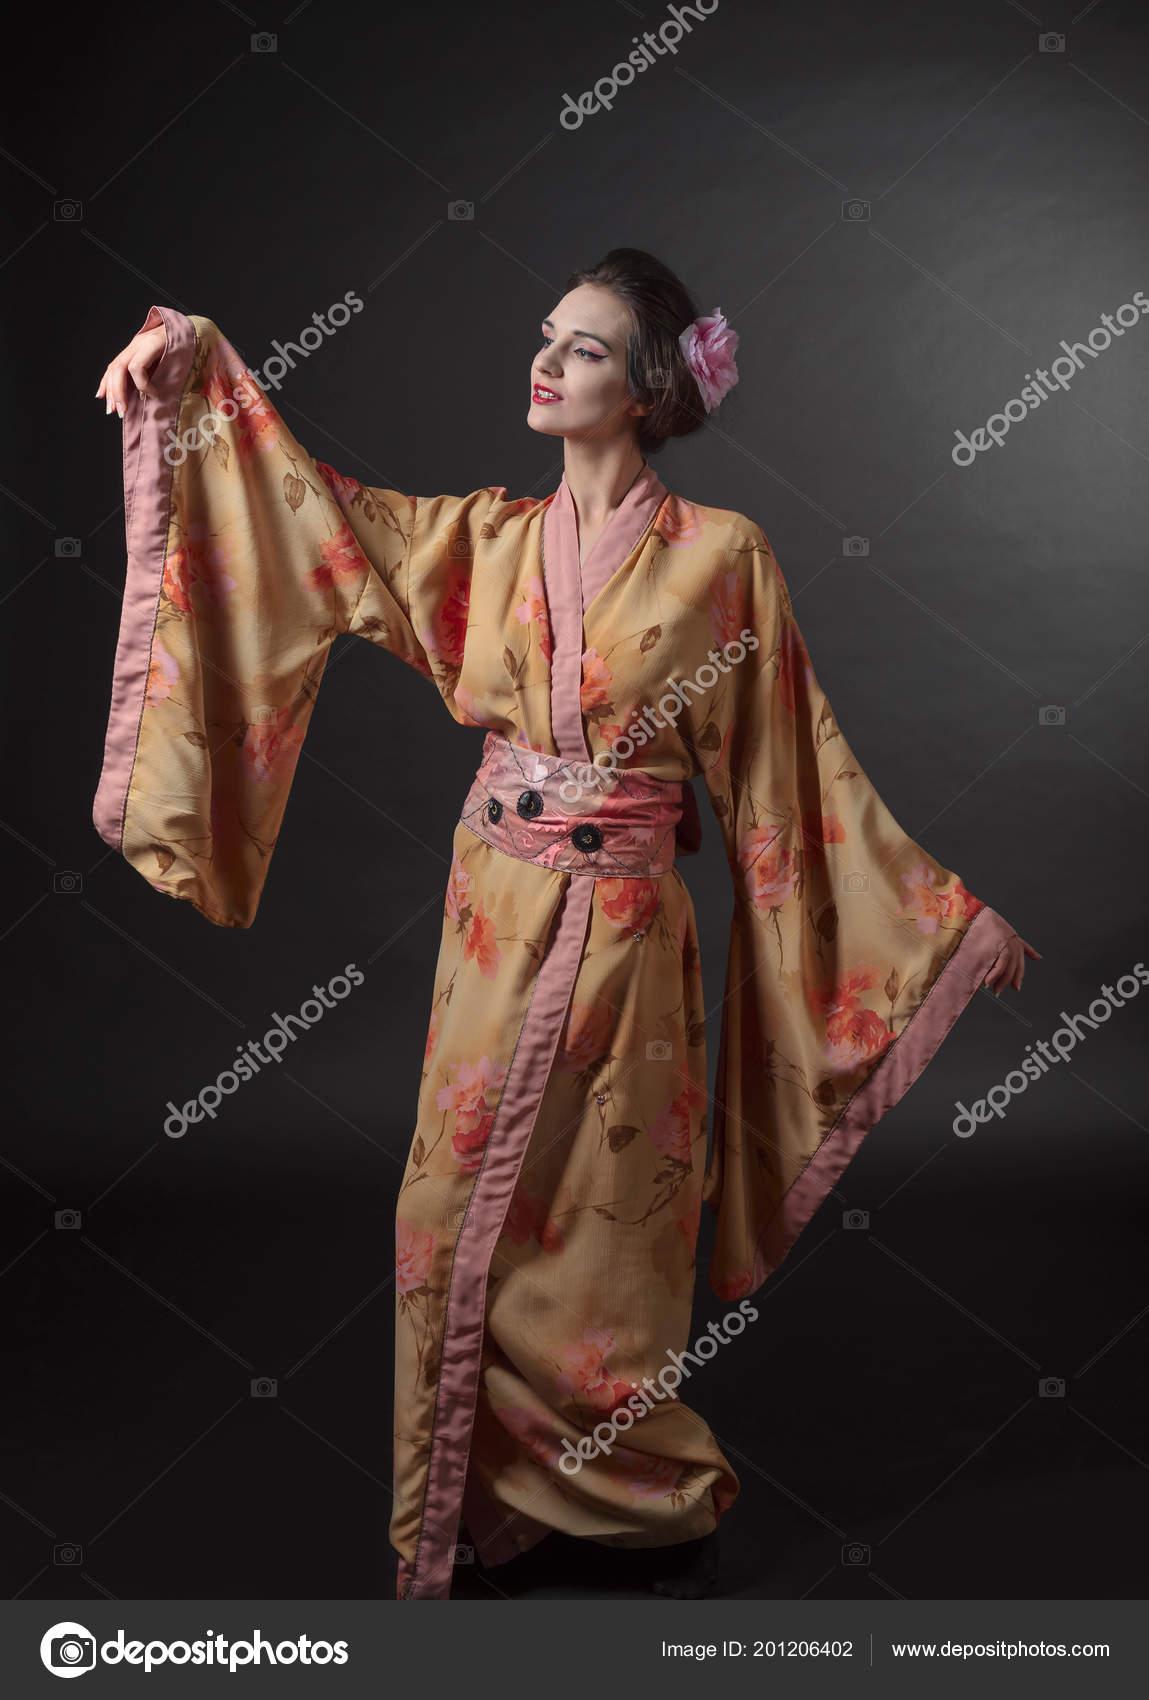 4c17d9900 Baile Mujer Kimono Japon Tradicional Sobre Fondo Negro Mujer Hermosa ...